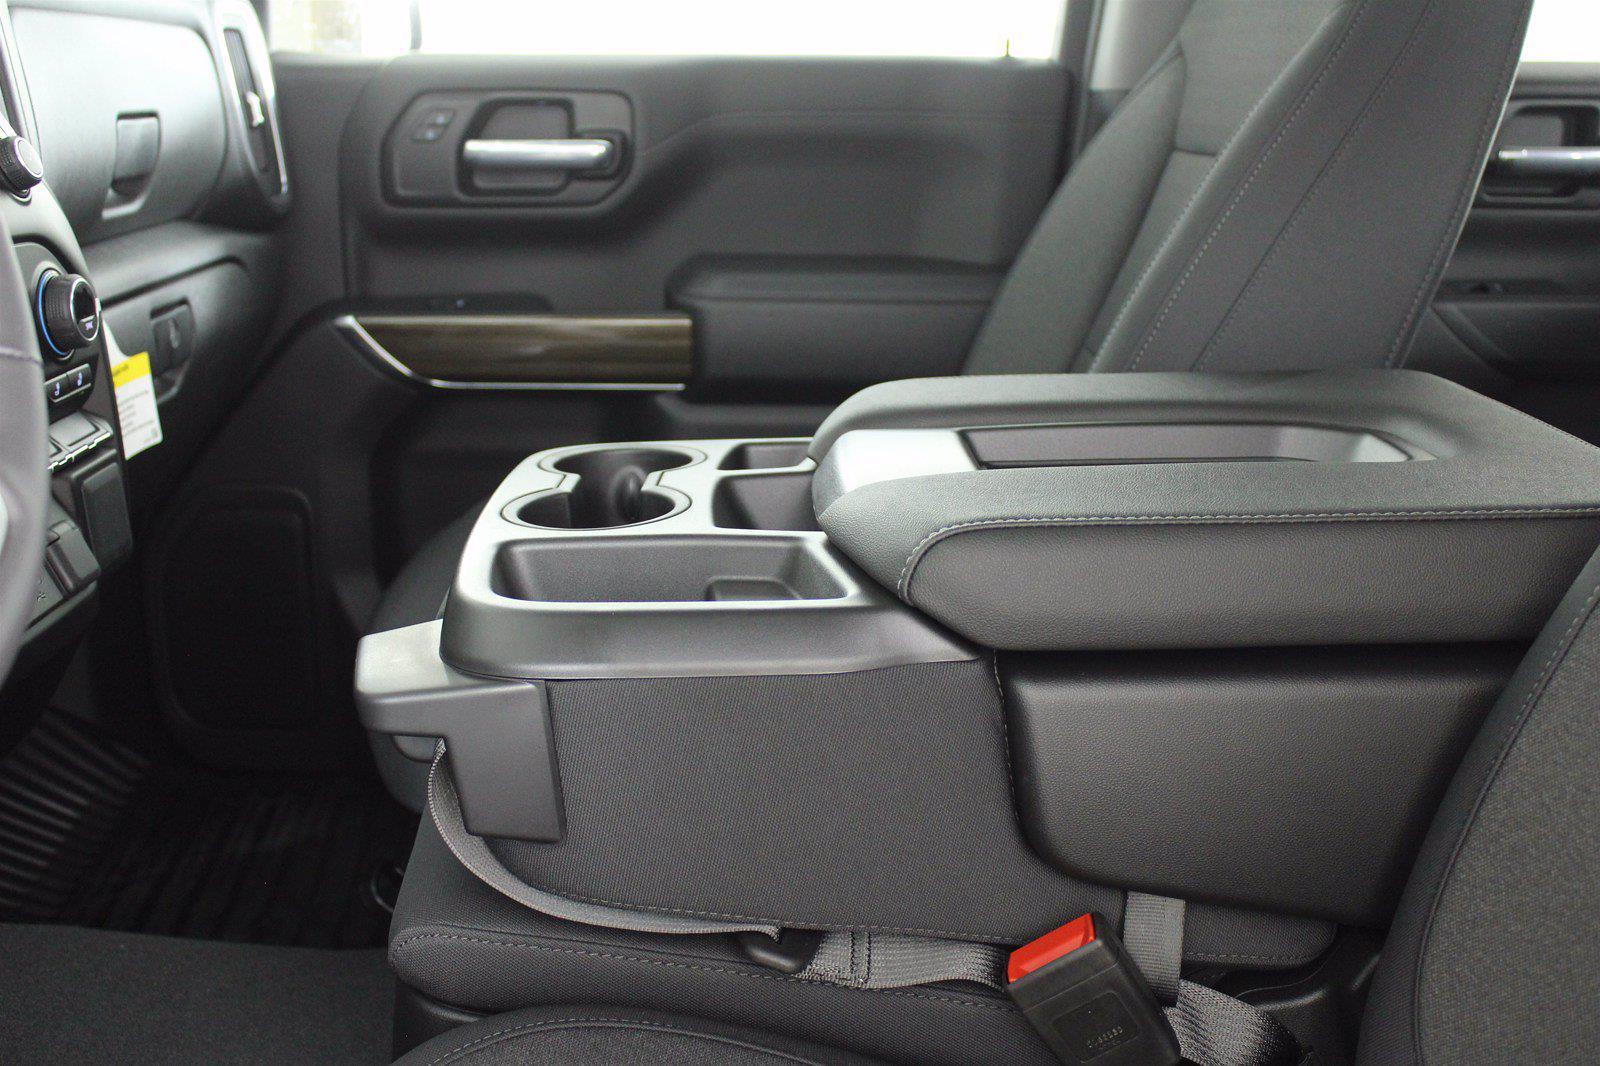 2021 Chevrolet Silverado 1500 Crew Cab 4x4, Pickup #D111143 - photo 13